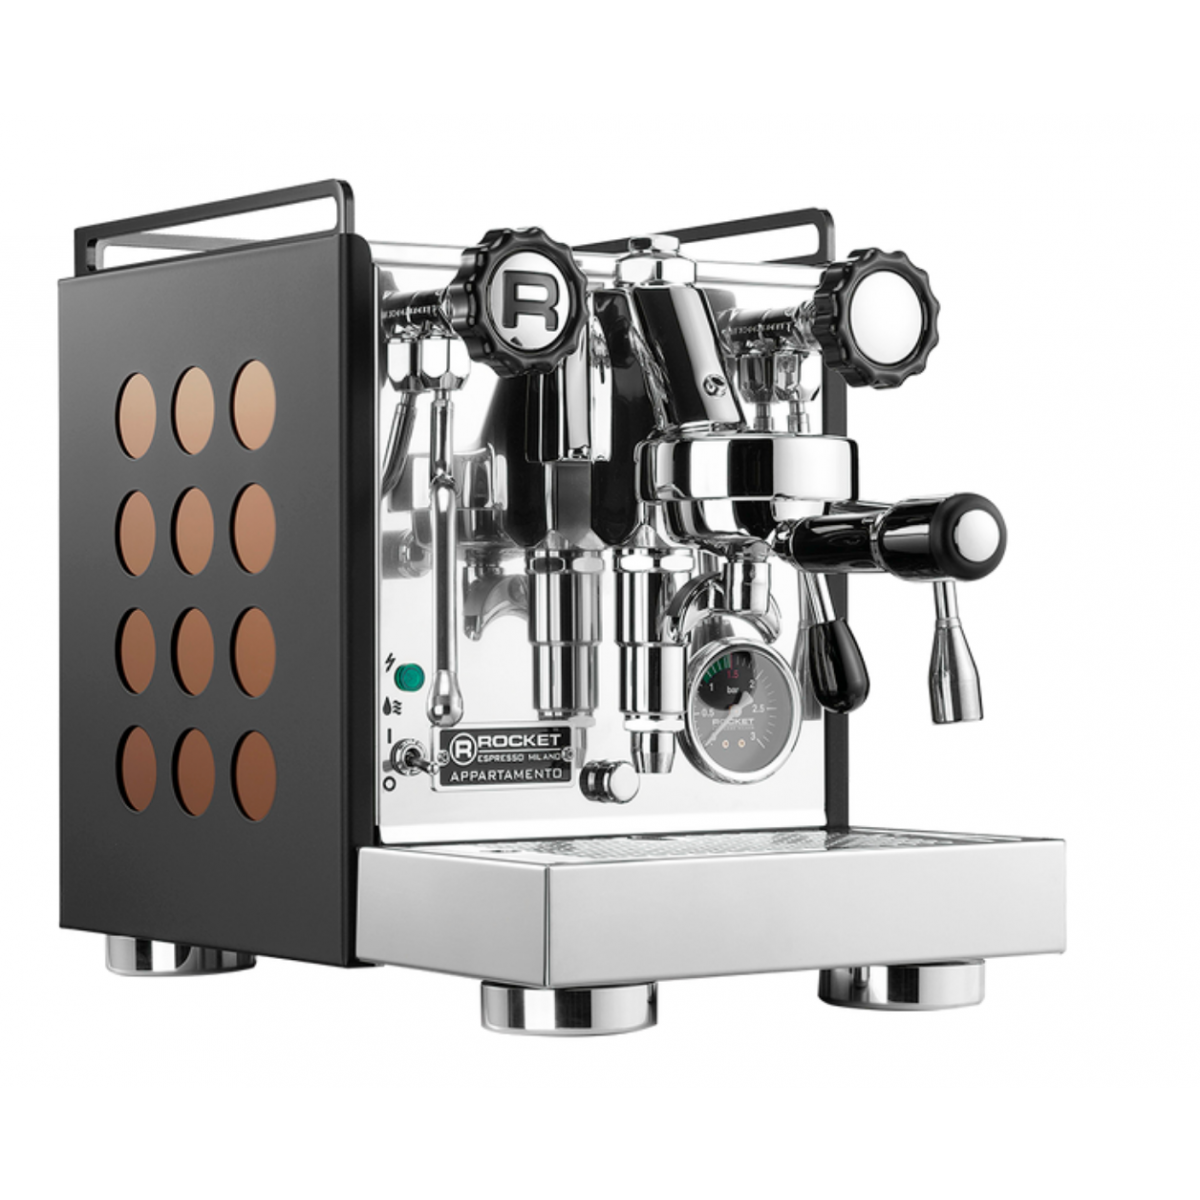 Rocket Appartamento Nera Kupfer Espressomaschine Sonderedition